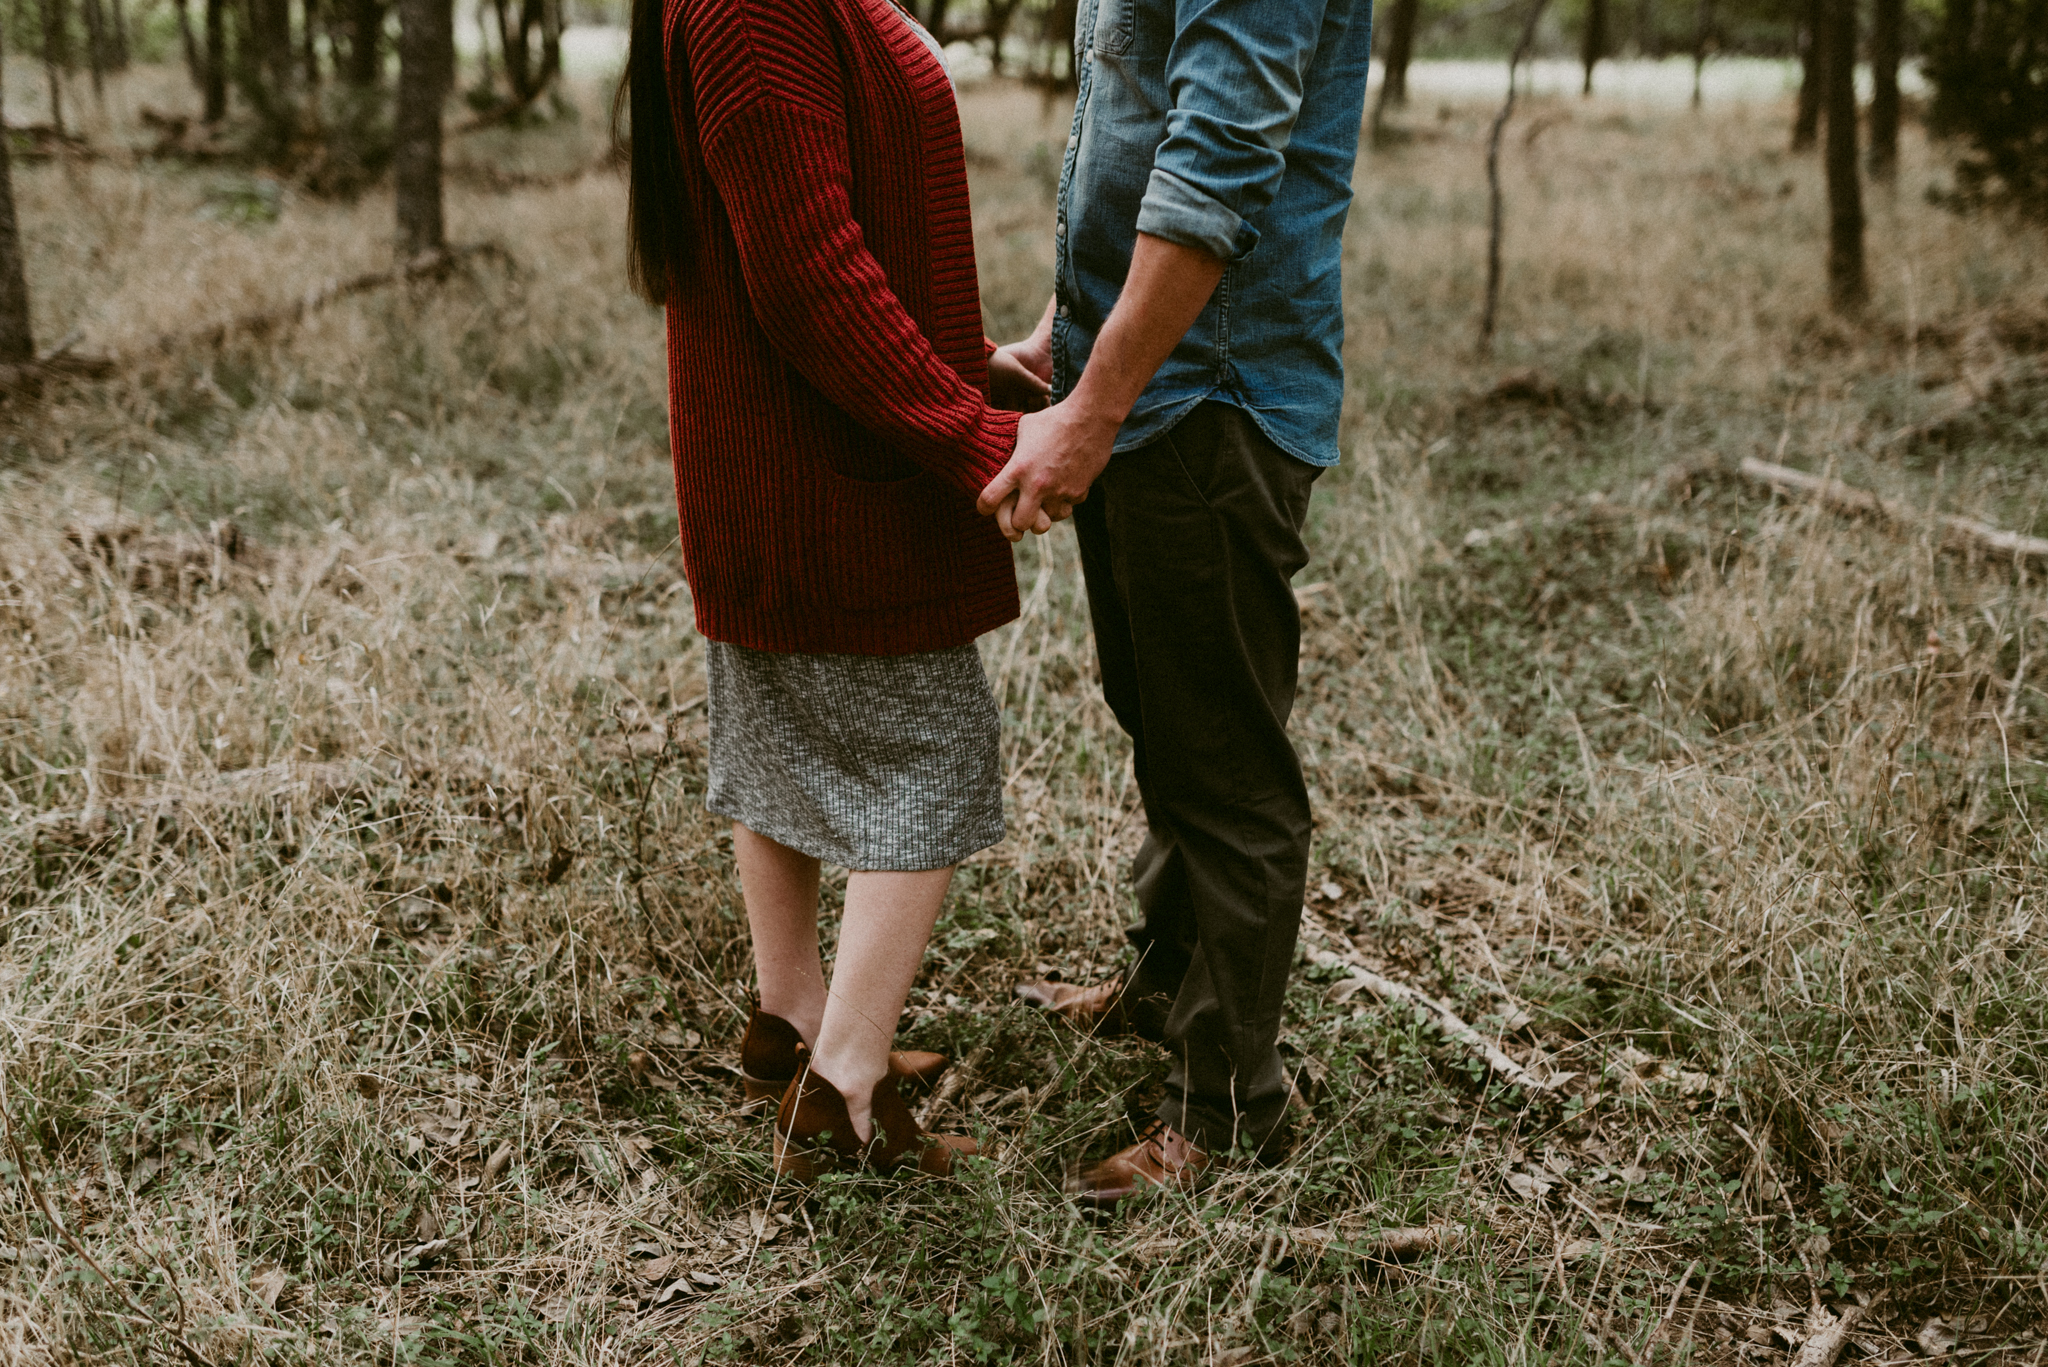 Kerlyn Van Gelder Photography - Austin Wedding Photographer - Mckinney Falls State Park Engagement Session - Kerlyn Van Gelder specializes in destination weddings, intimate weddings and destination elopements.